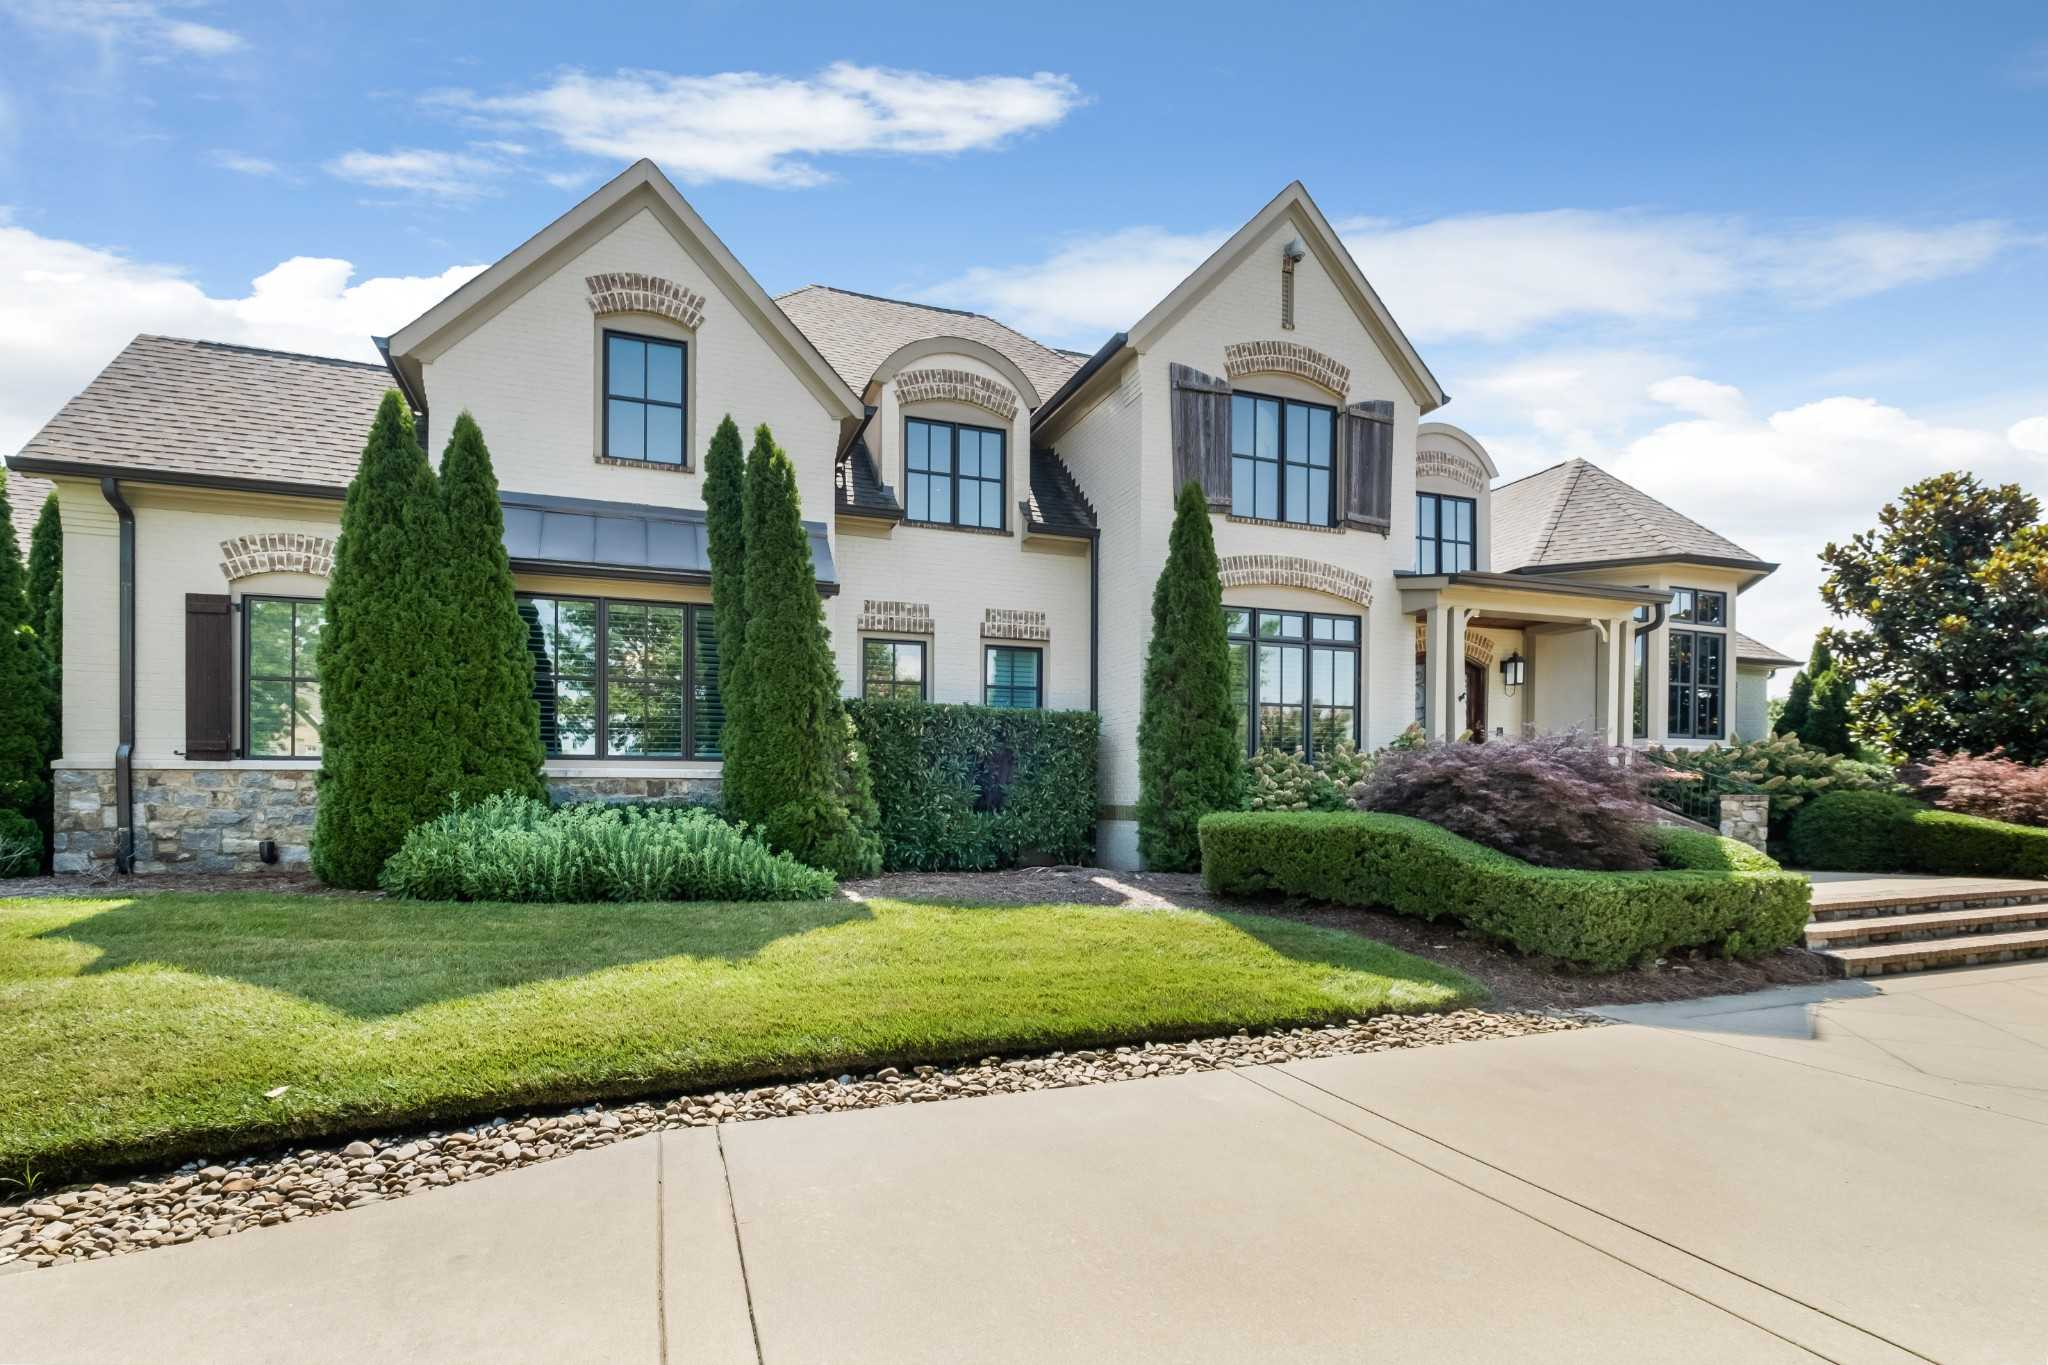 $3,000,000 - 6Br/8Ba -  for Sale in Legends Ridge Add Sec 2, Franklin